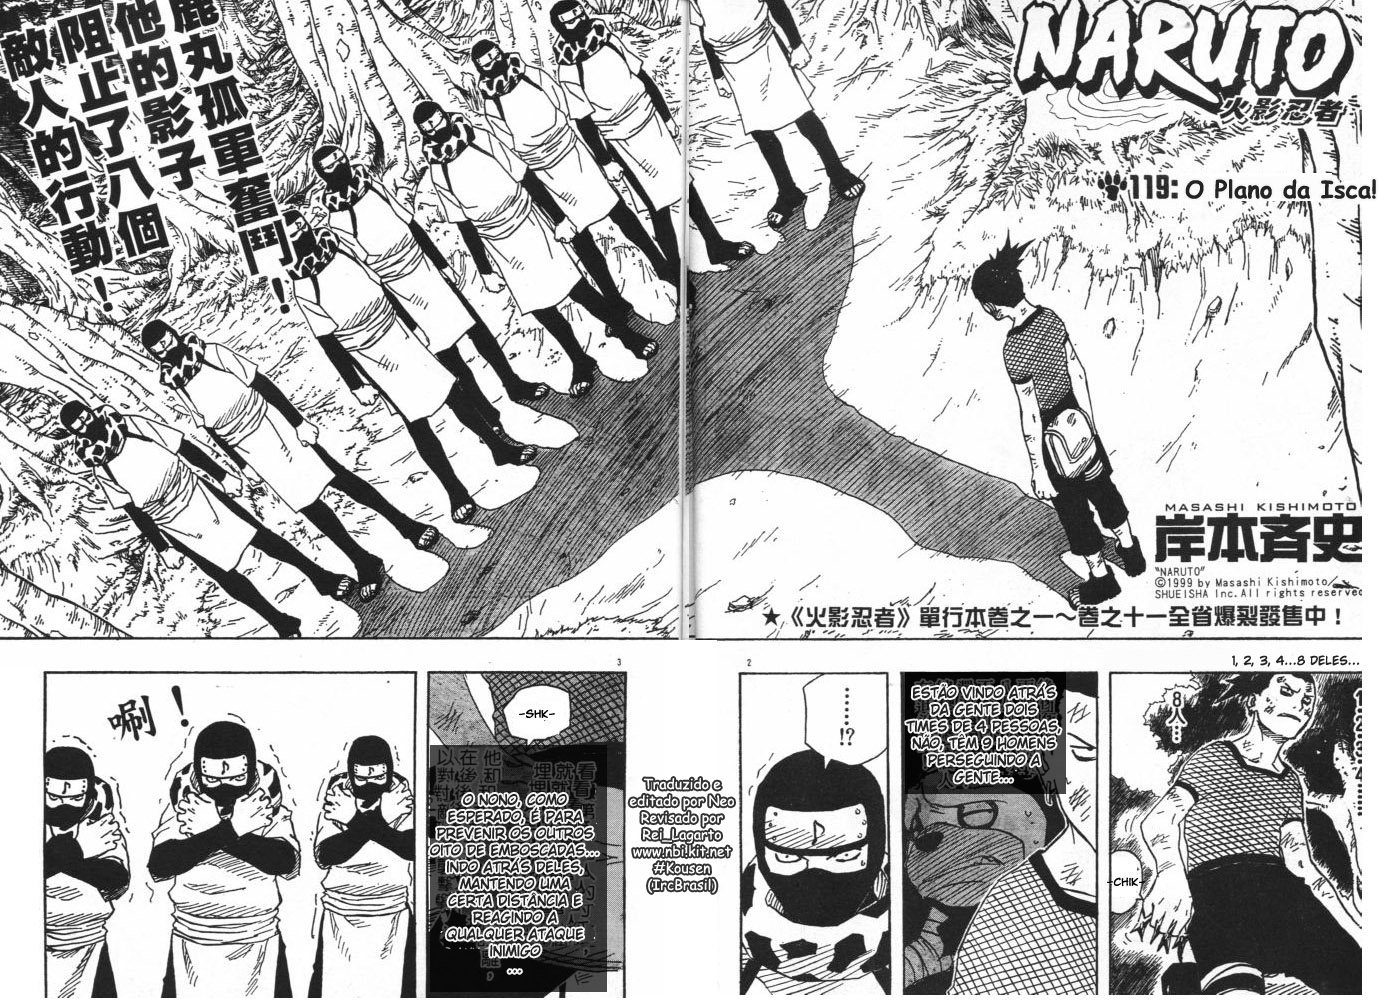 Tobirama foi morto por Kinkaku & Ginkaku [Tradução Oficial Panini] - Página 4 02